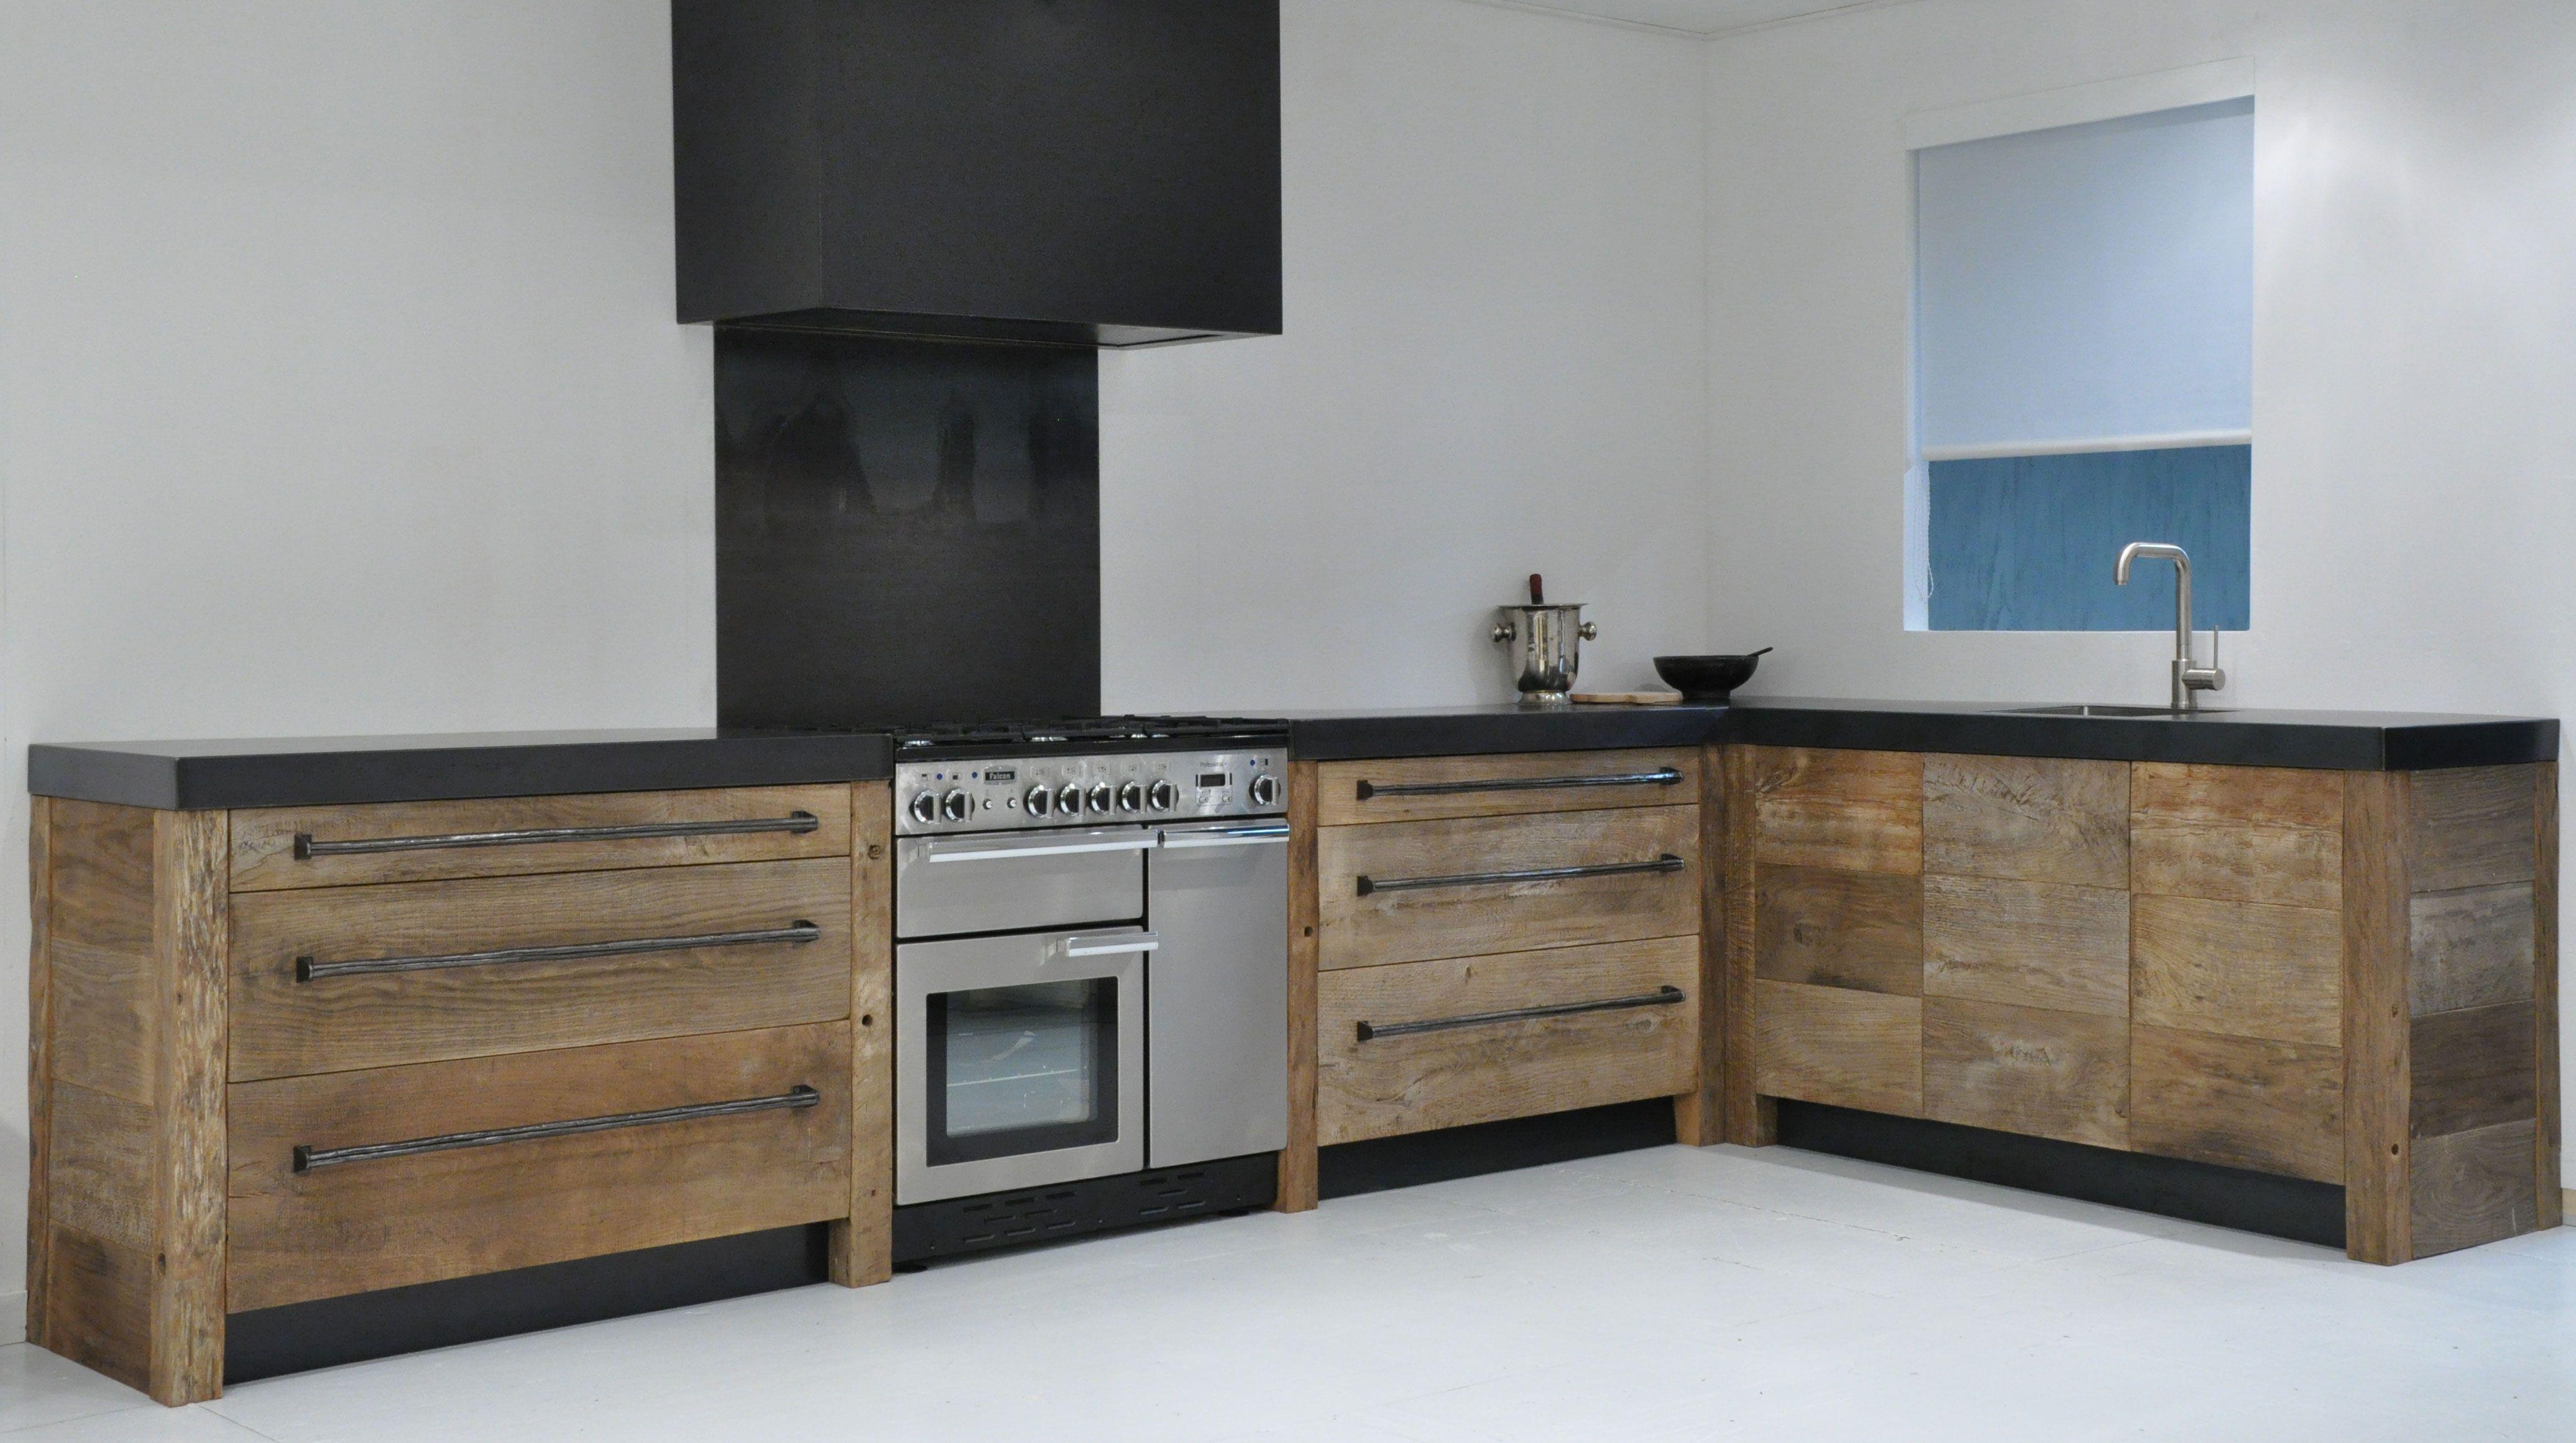 Steigerhouten Keuken Ikea : Steigerhouten keukenkastdeurtjes vaatwasser google zoeken